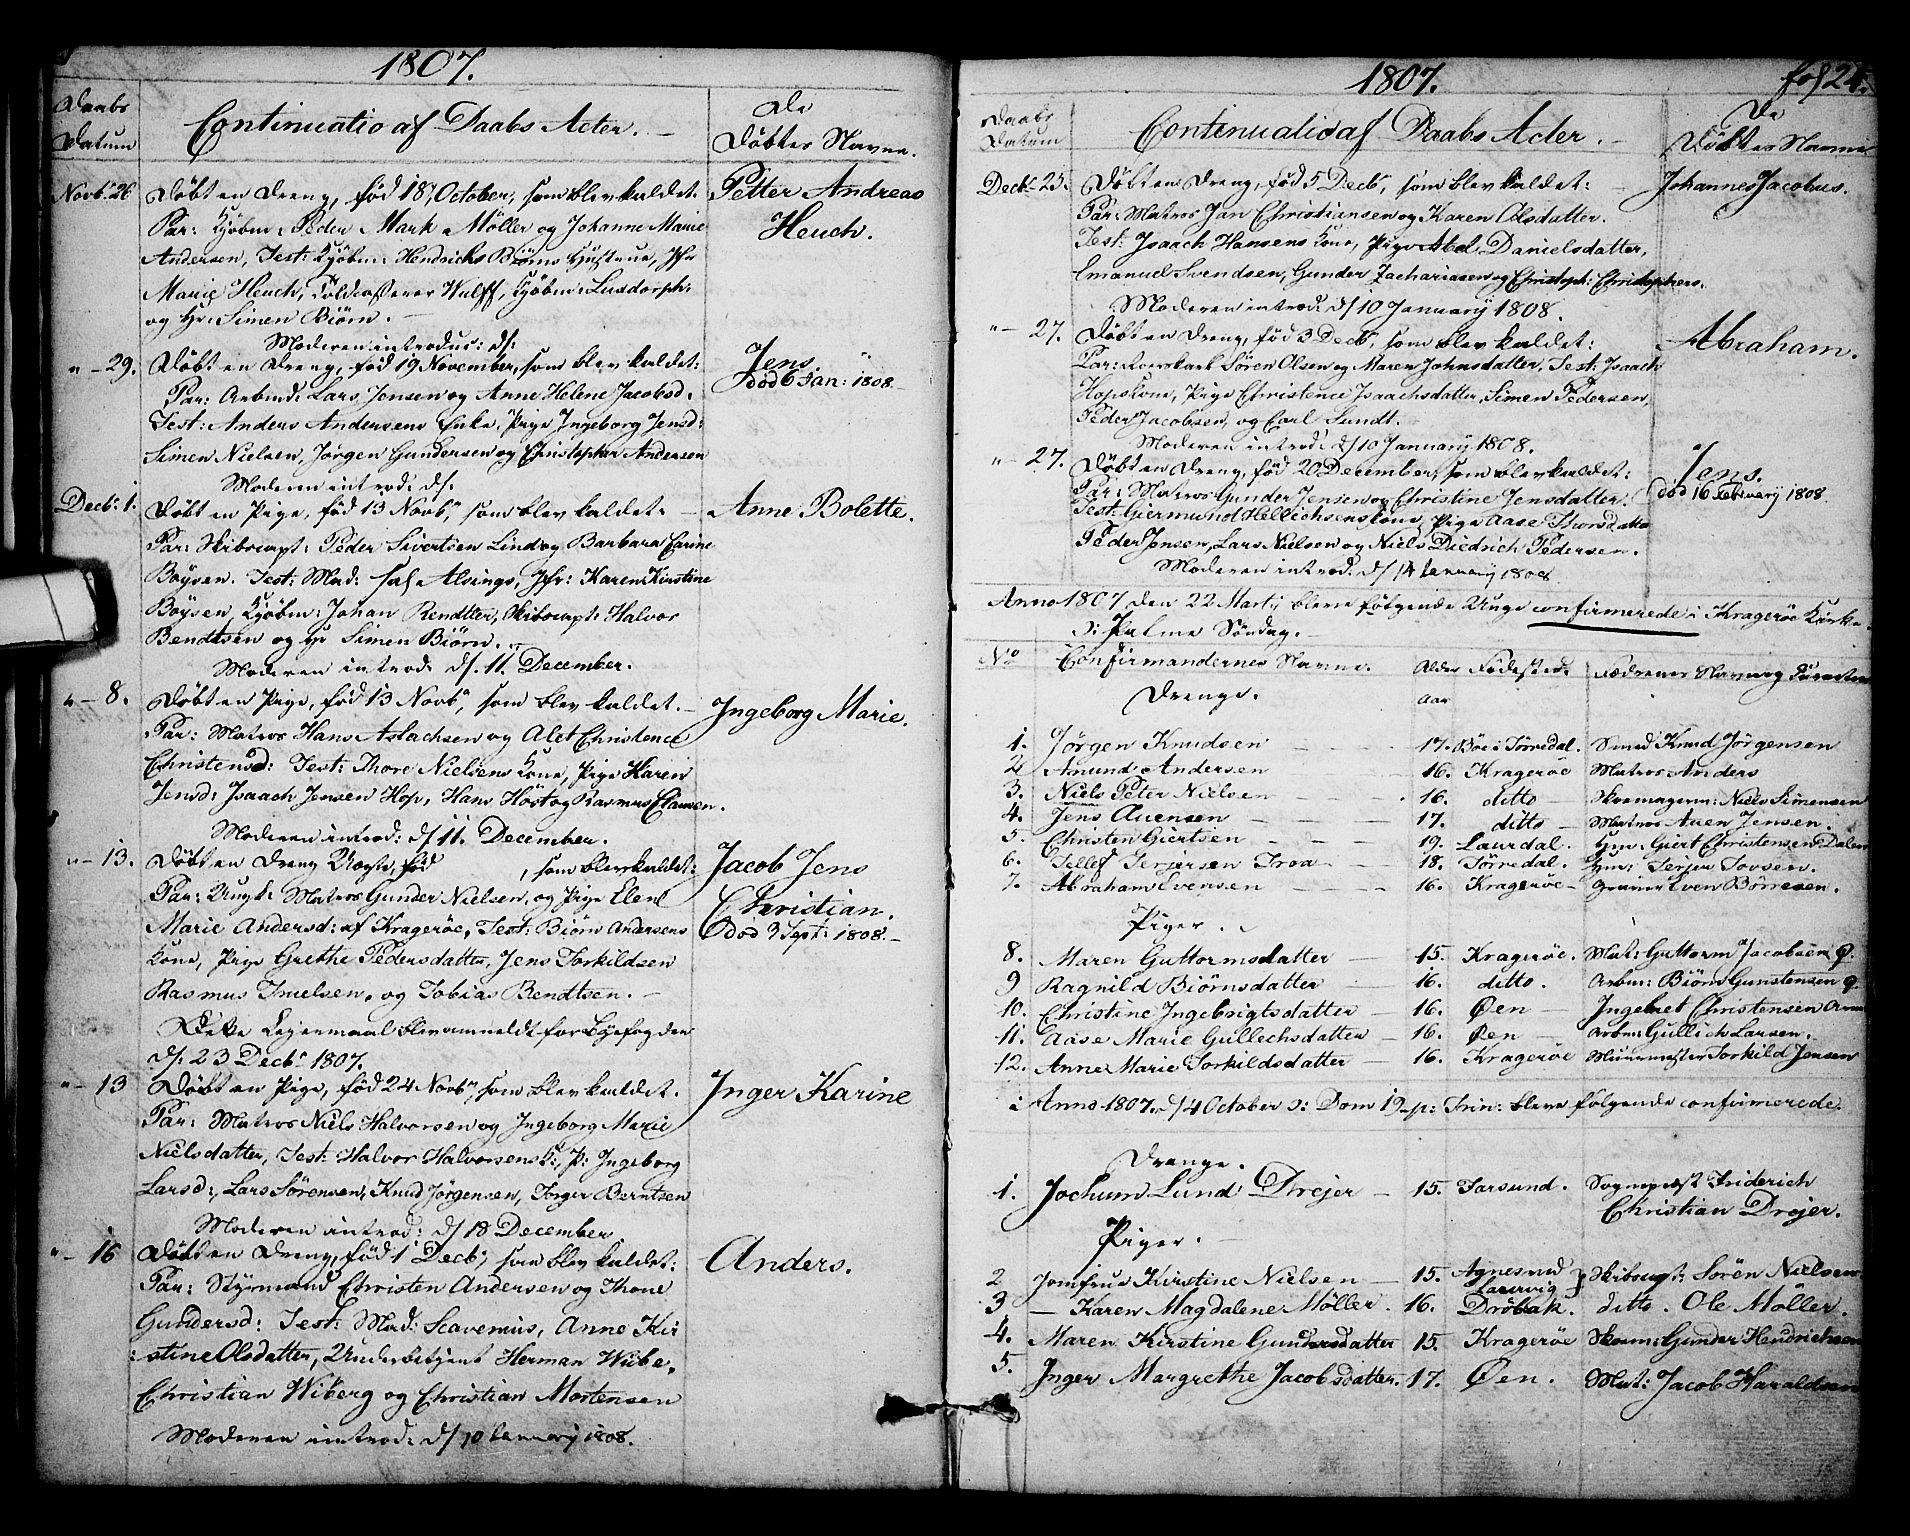 SAKO, Kragerø kirkebøker, F/Fa/L0003: Ministerialbok nr. 3, 1802-1813, s. 24